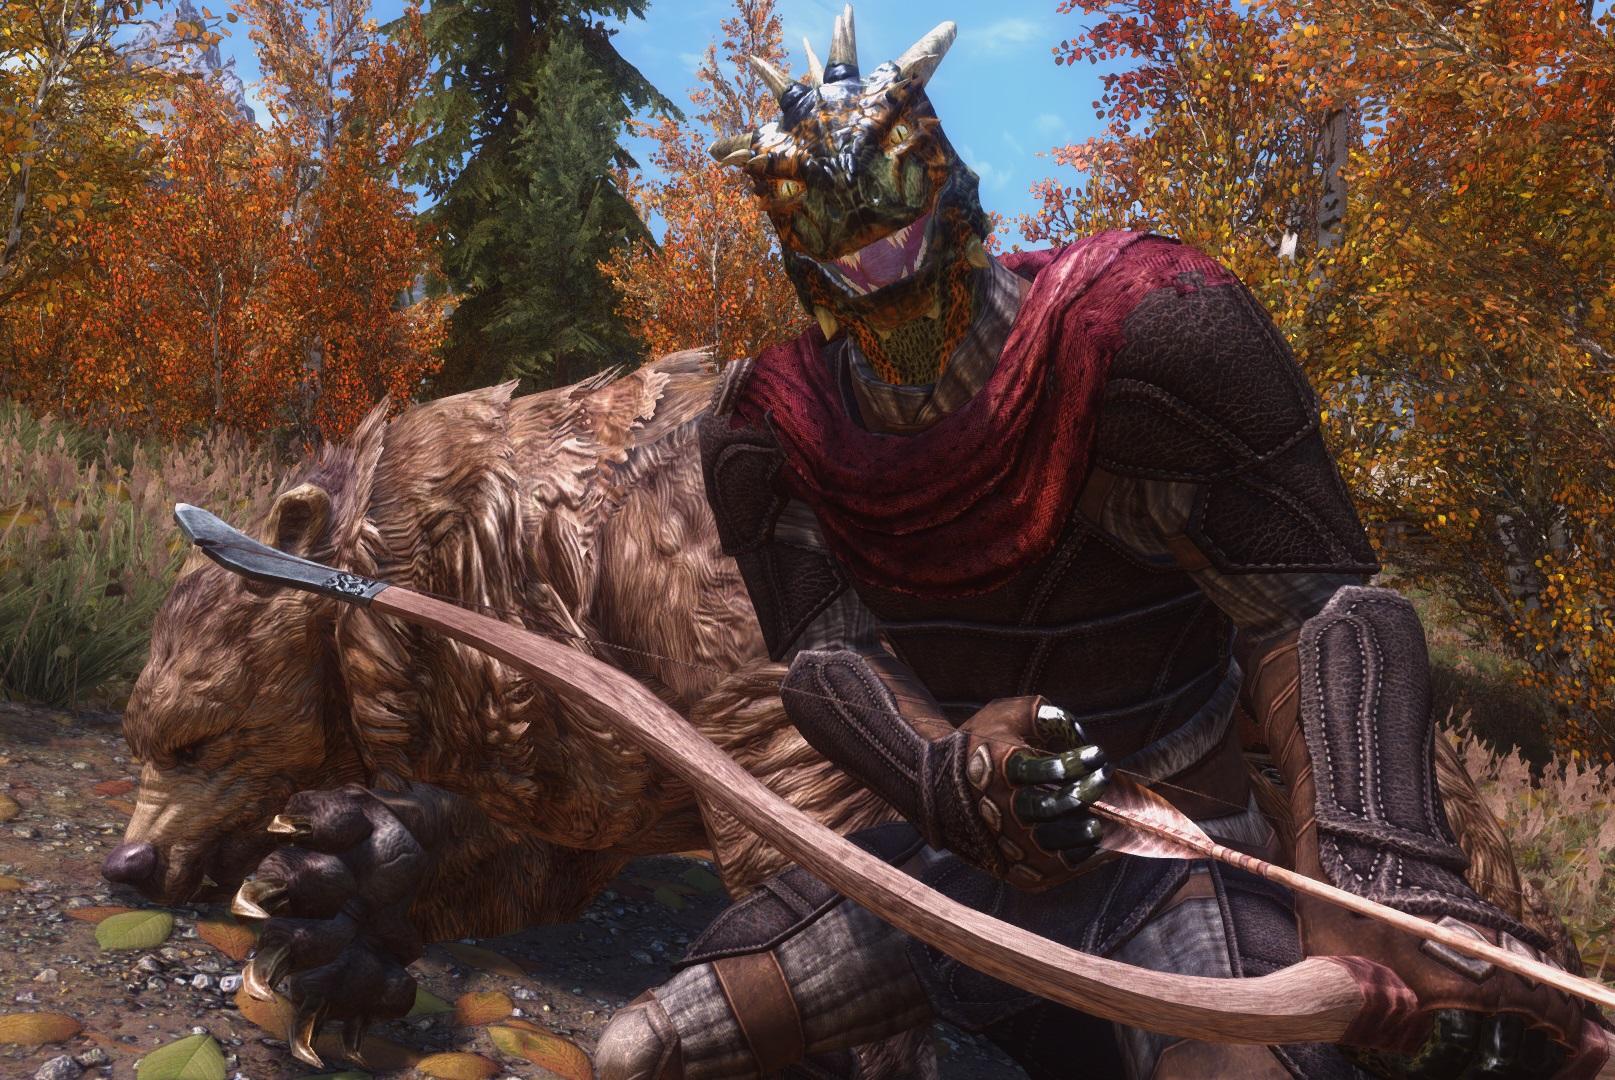 Jama - Elder Scrolls 5: Skyrim, the